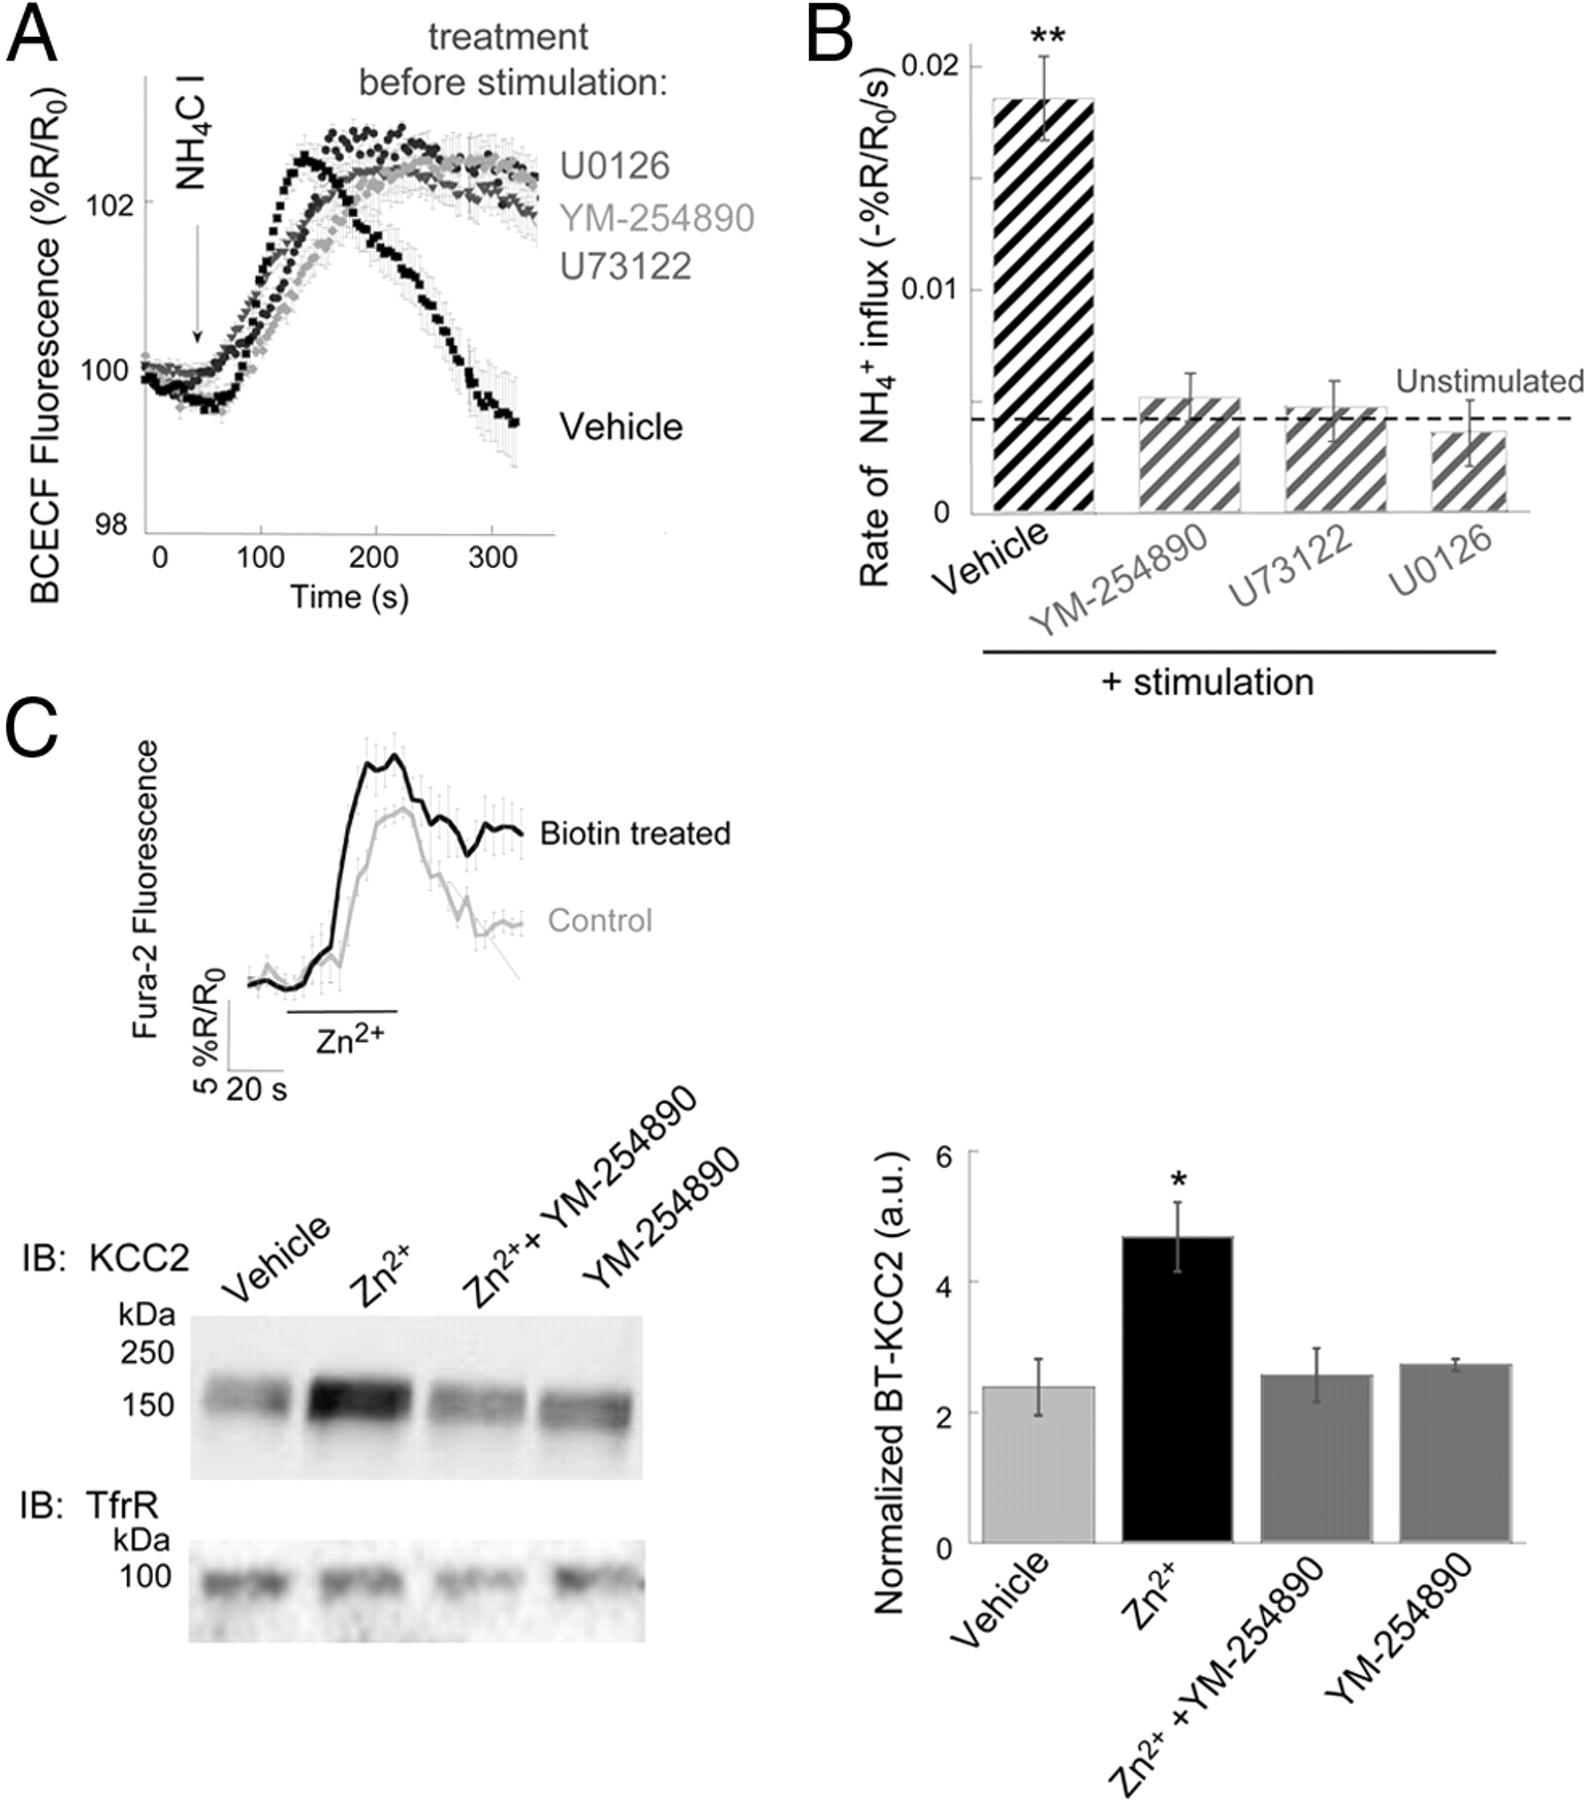 Upregulation Of Kcc2 Activity By Zinc Mediated Neurotransmission Via The Mznr Gpr39 Receptor